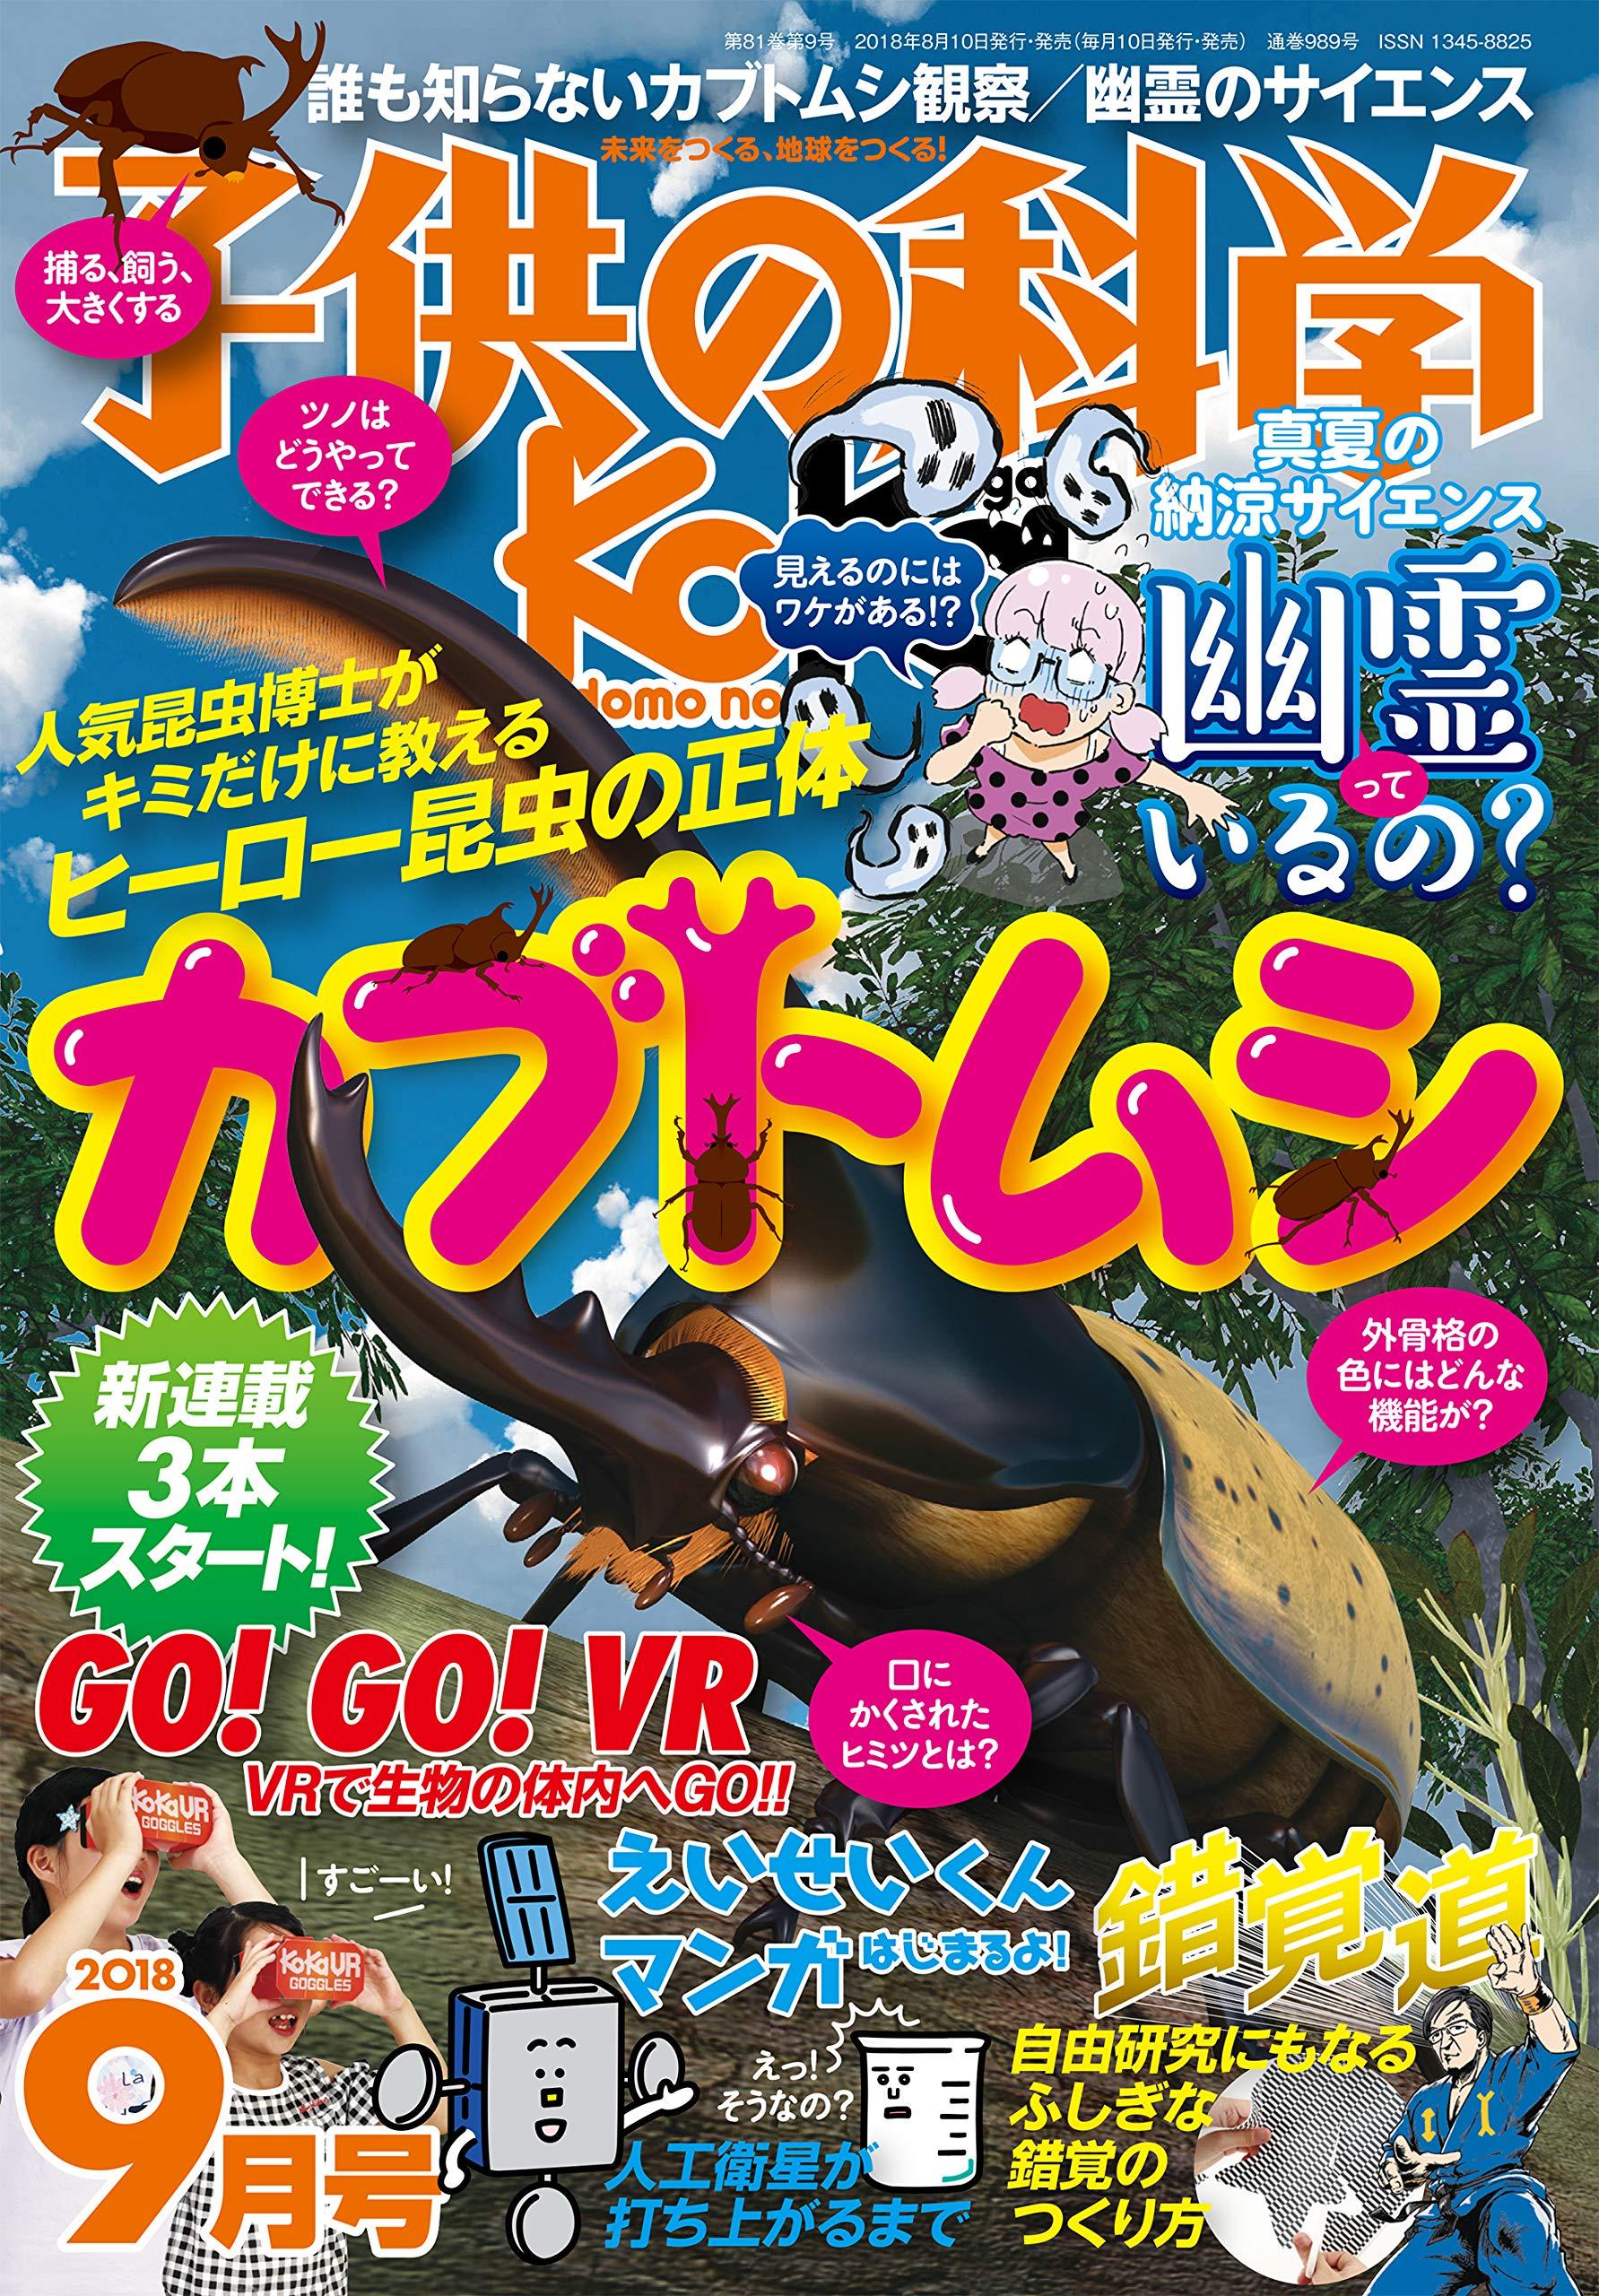 JAPANESE MAGAZINE Kids science 2018, September issue: Cheng